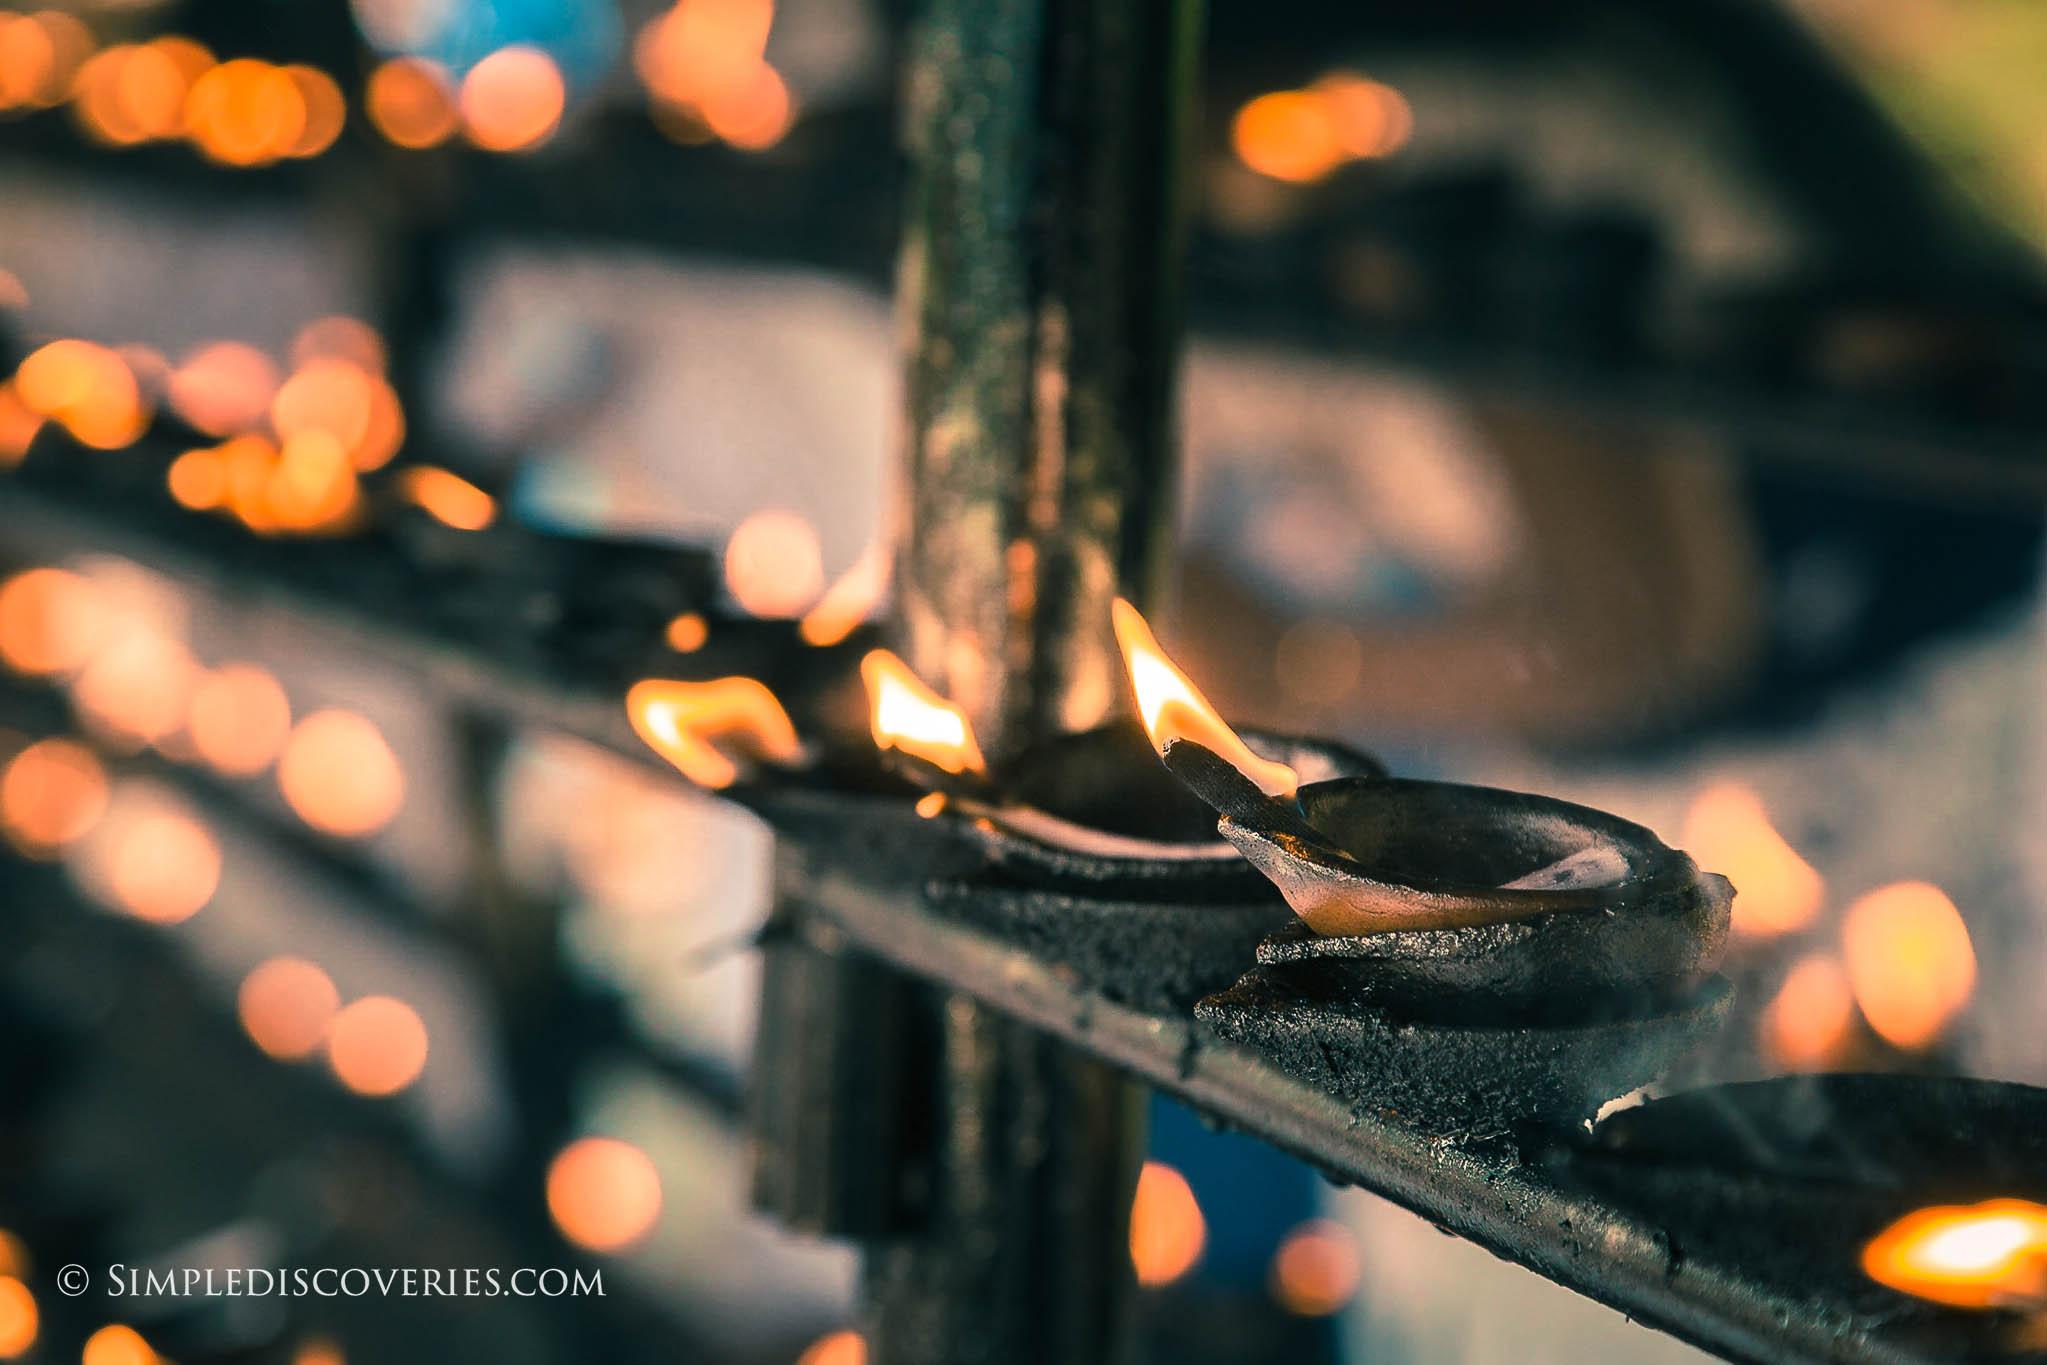 srilanka_candles